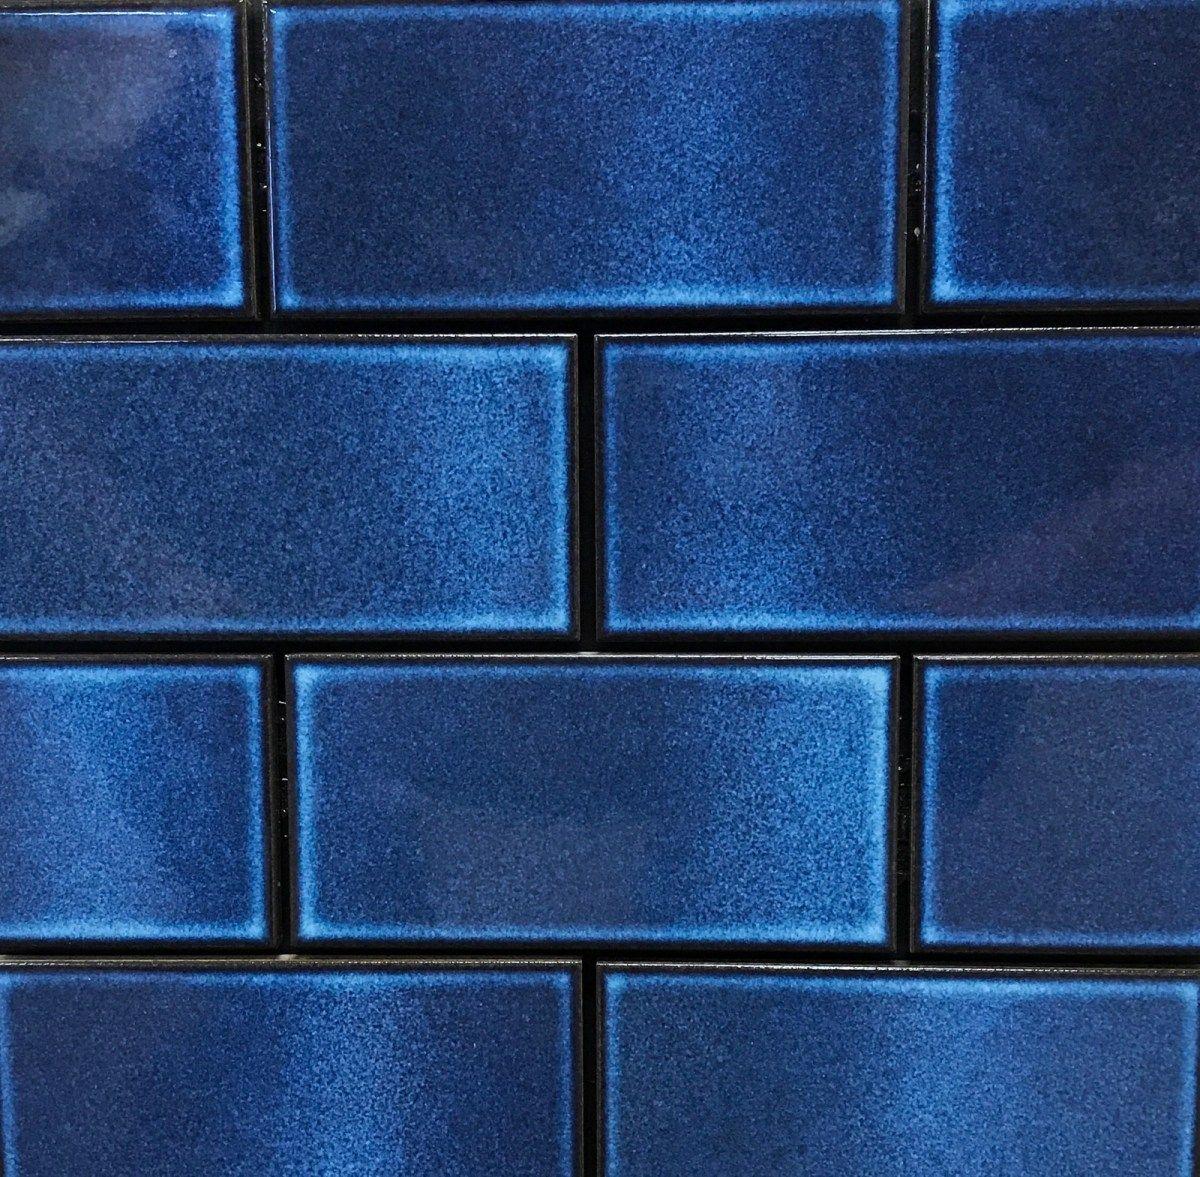 Portugal, Blue And White Ceramic Azulejo Tiles Stock Photo